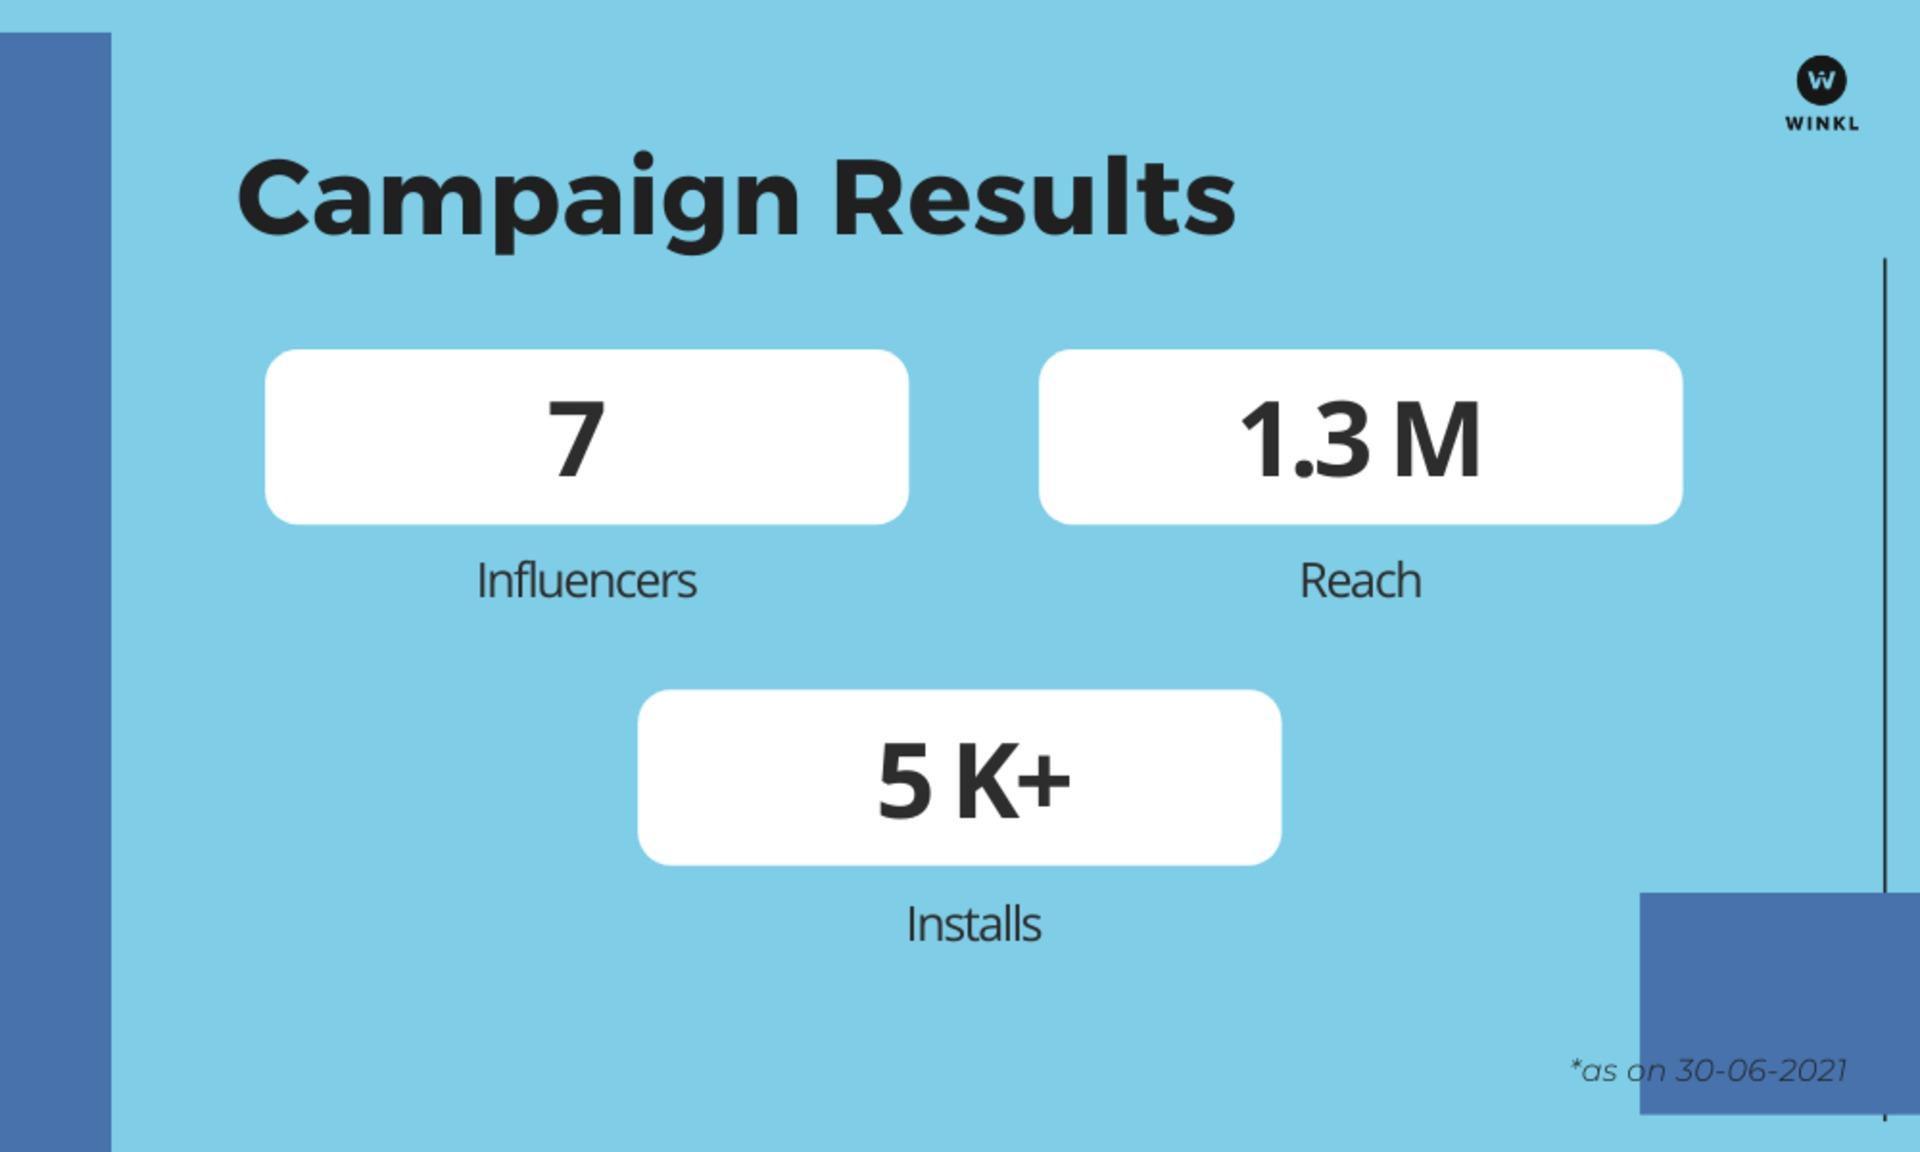 Winkl on Influencer Marketing - 2